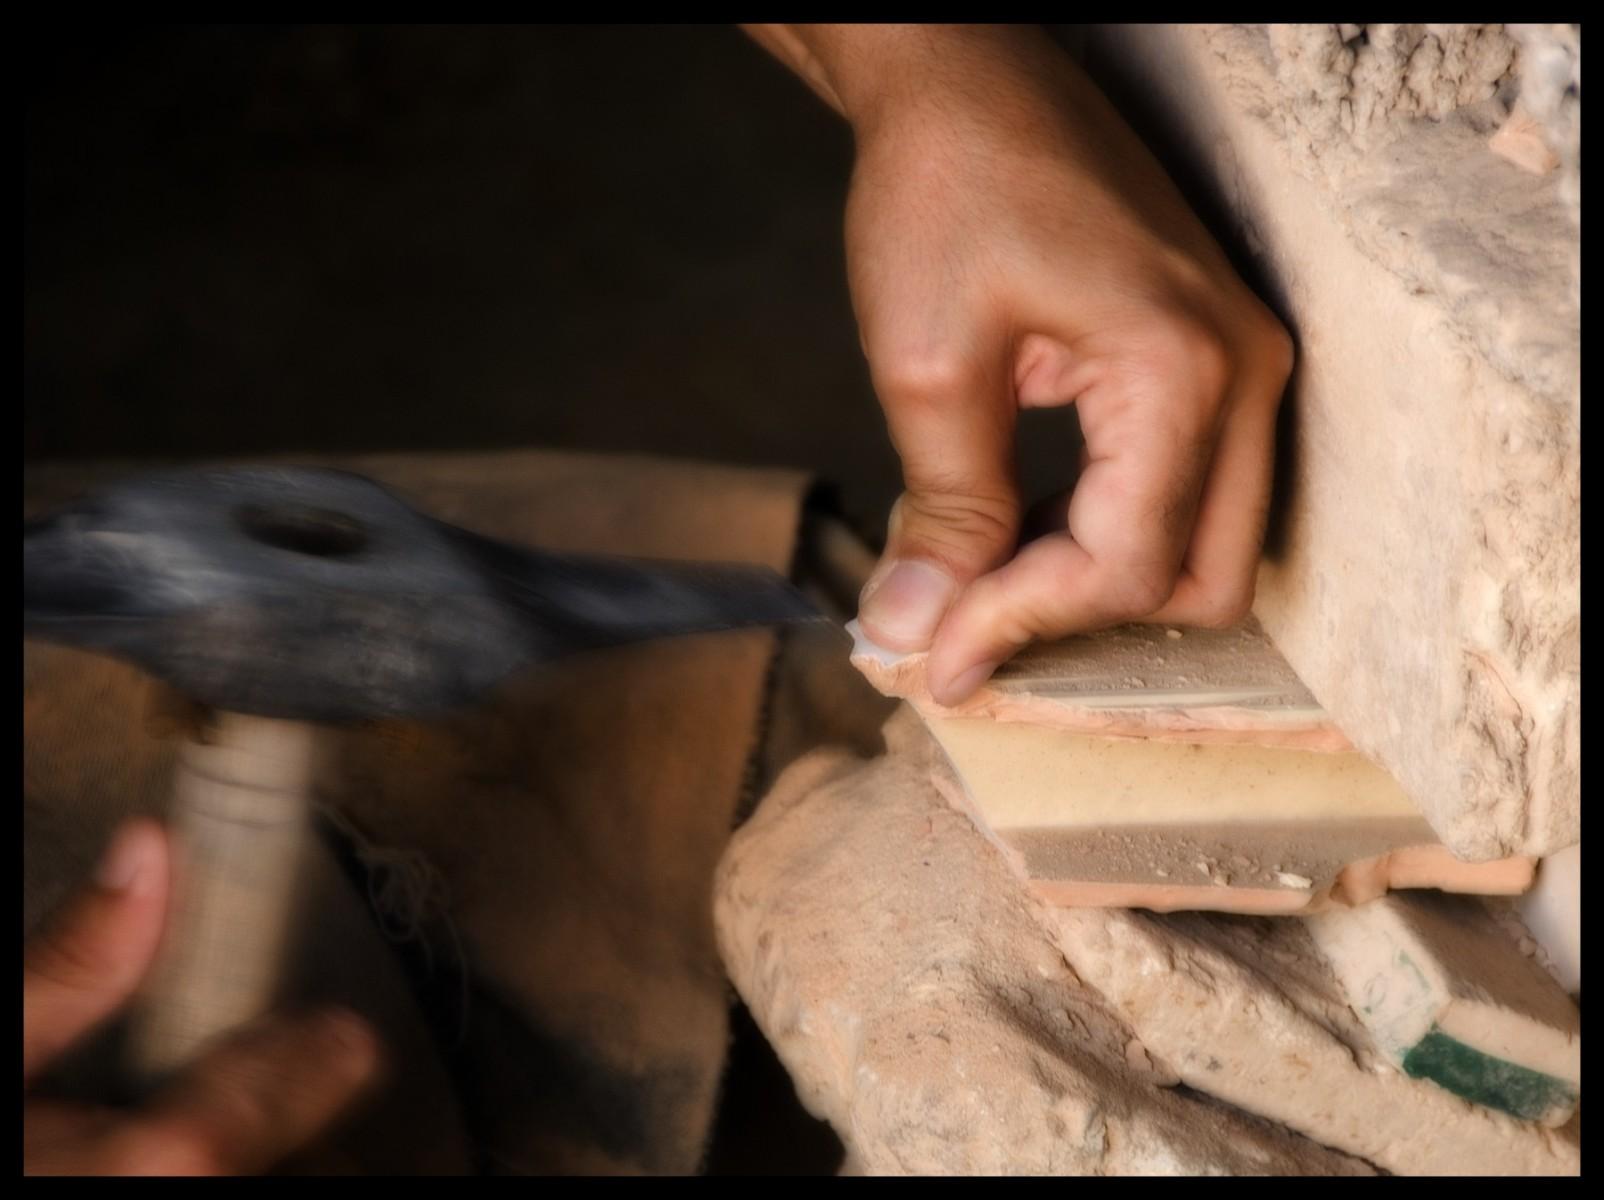 96816_DSC0053 hammer man 2